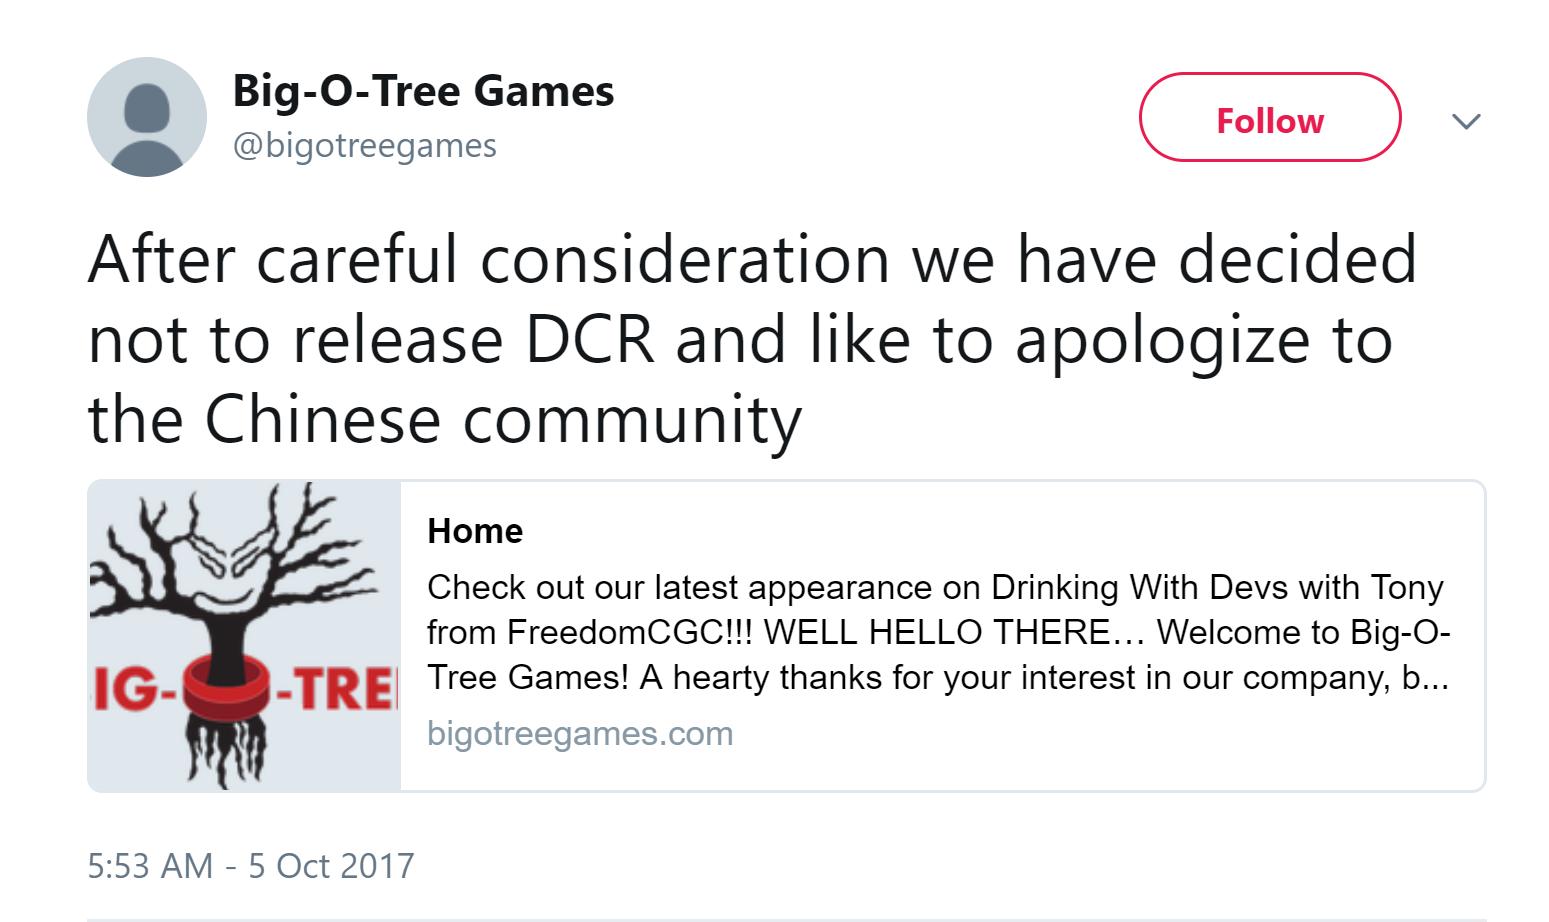 「Big-O-Tree Games」遊戲開發公司在推特等社交媒體上發表道歉聲明。(取自推特)